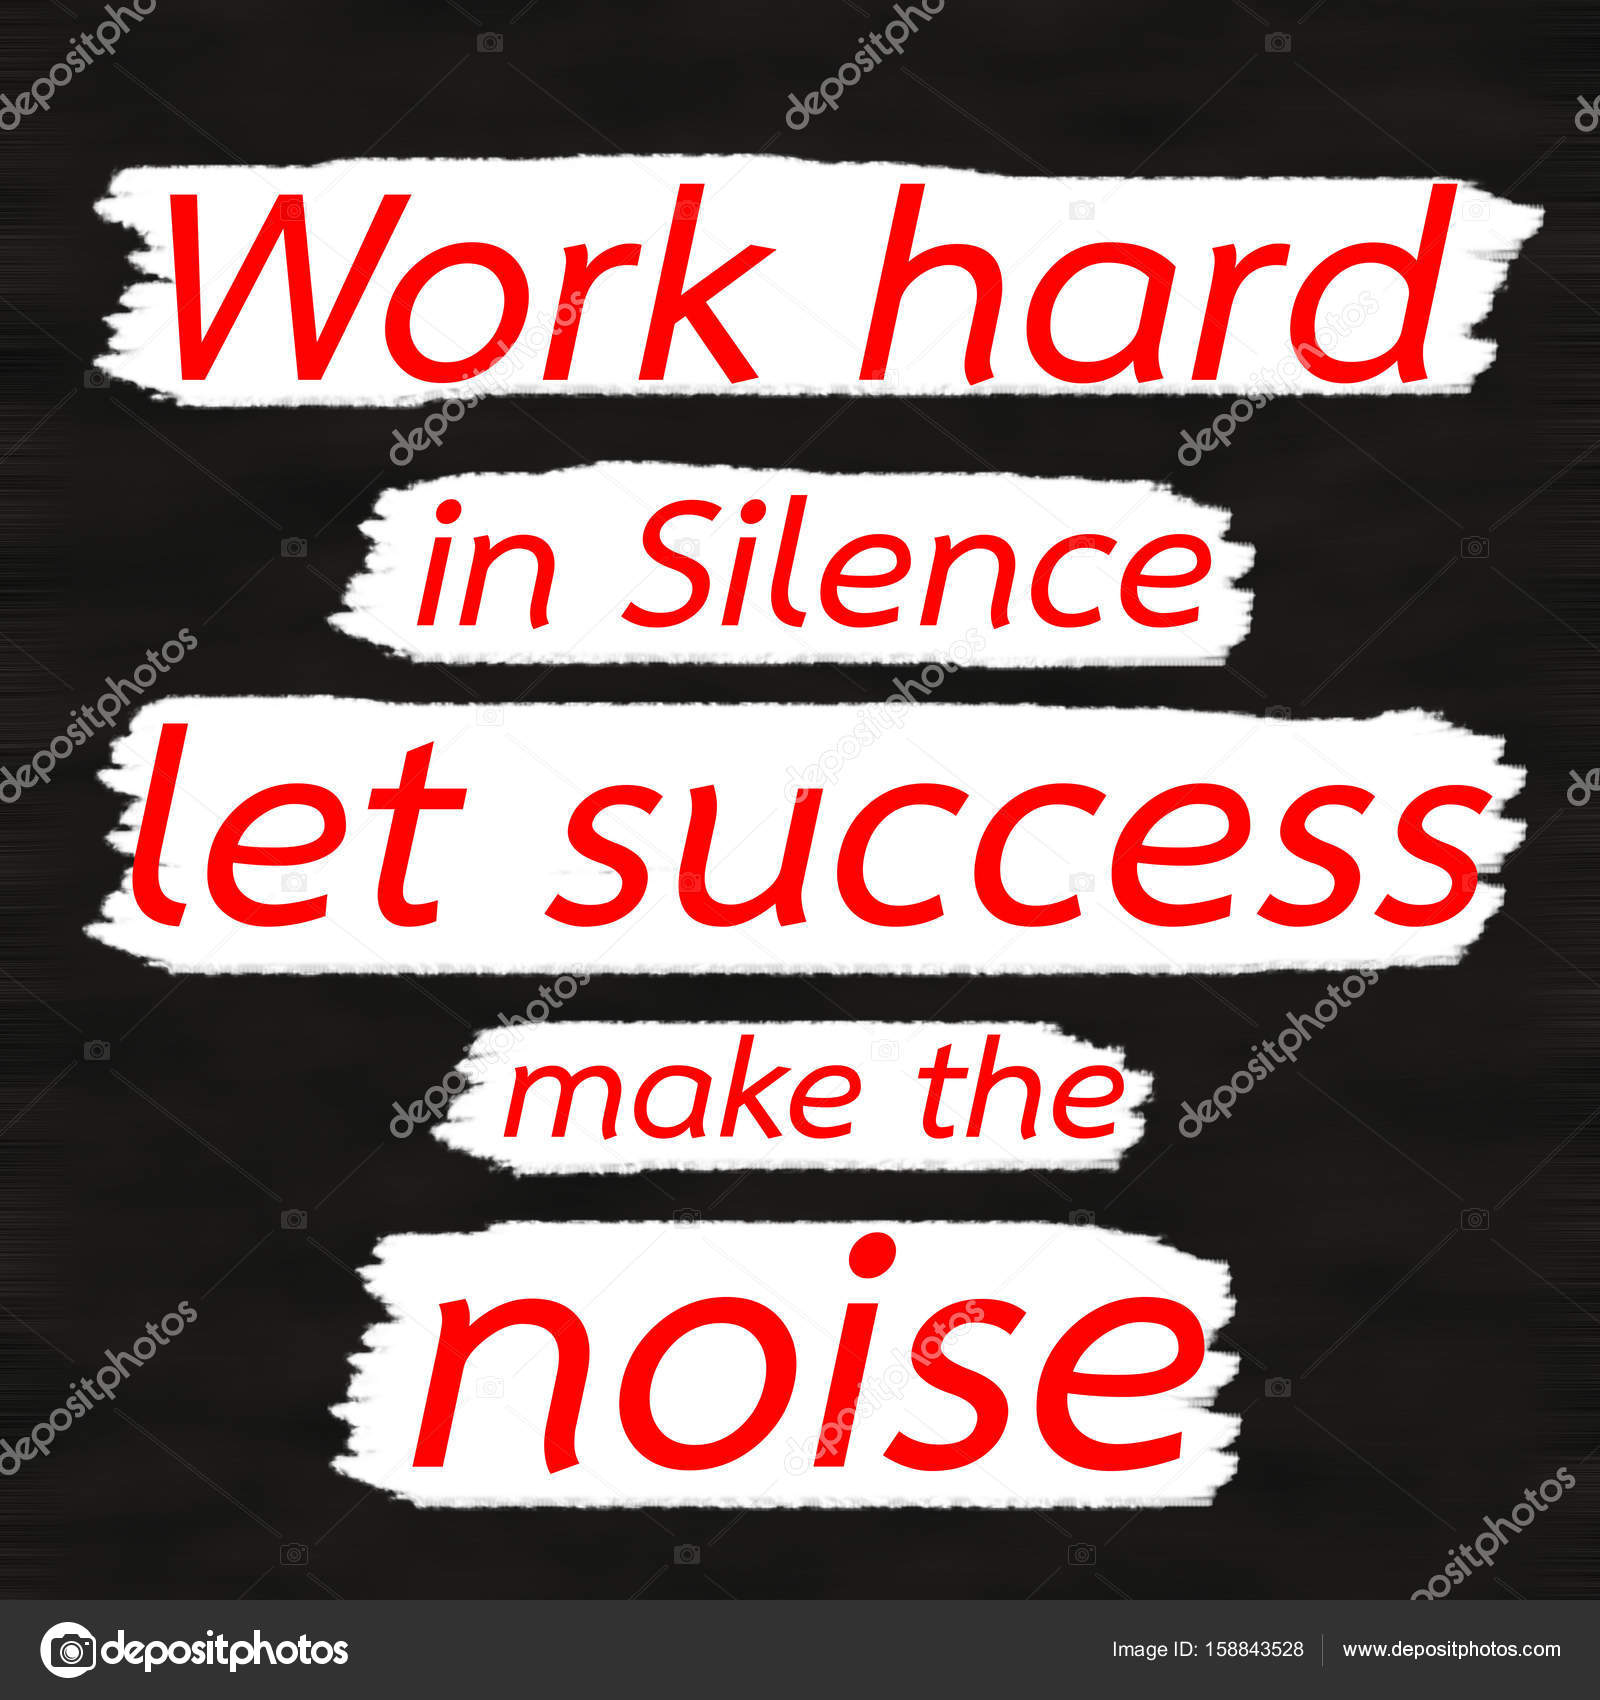 Work Hard In Silence Let Success Make The Noisecreative Inspiring